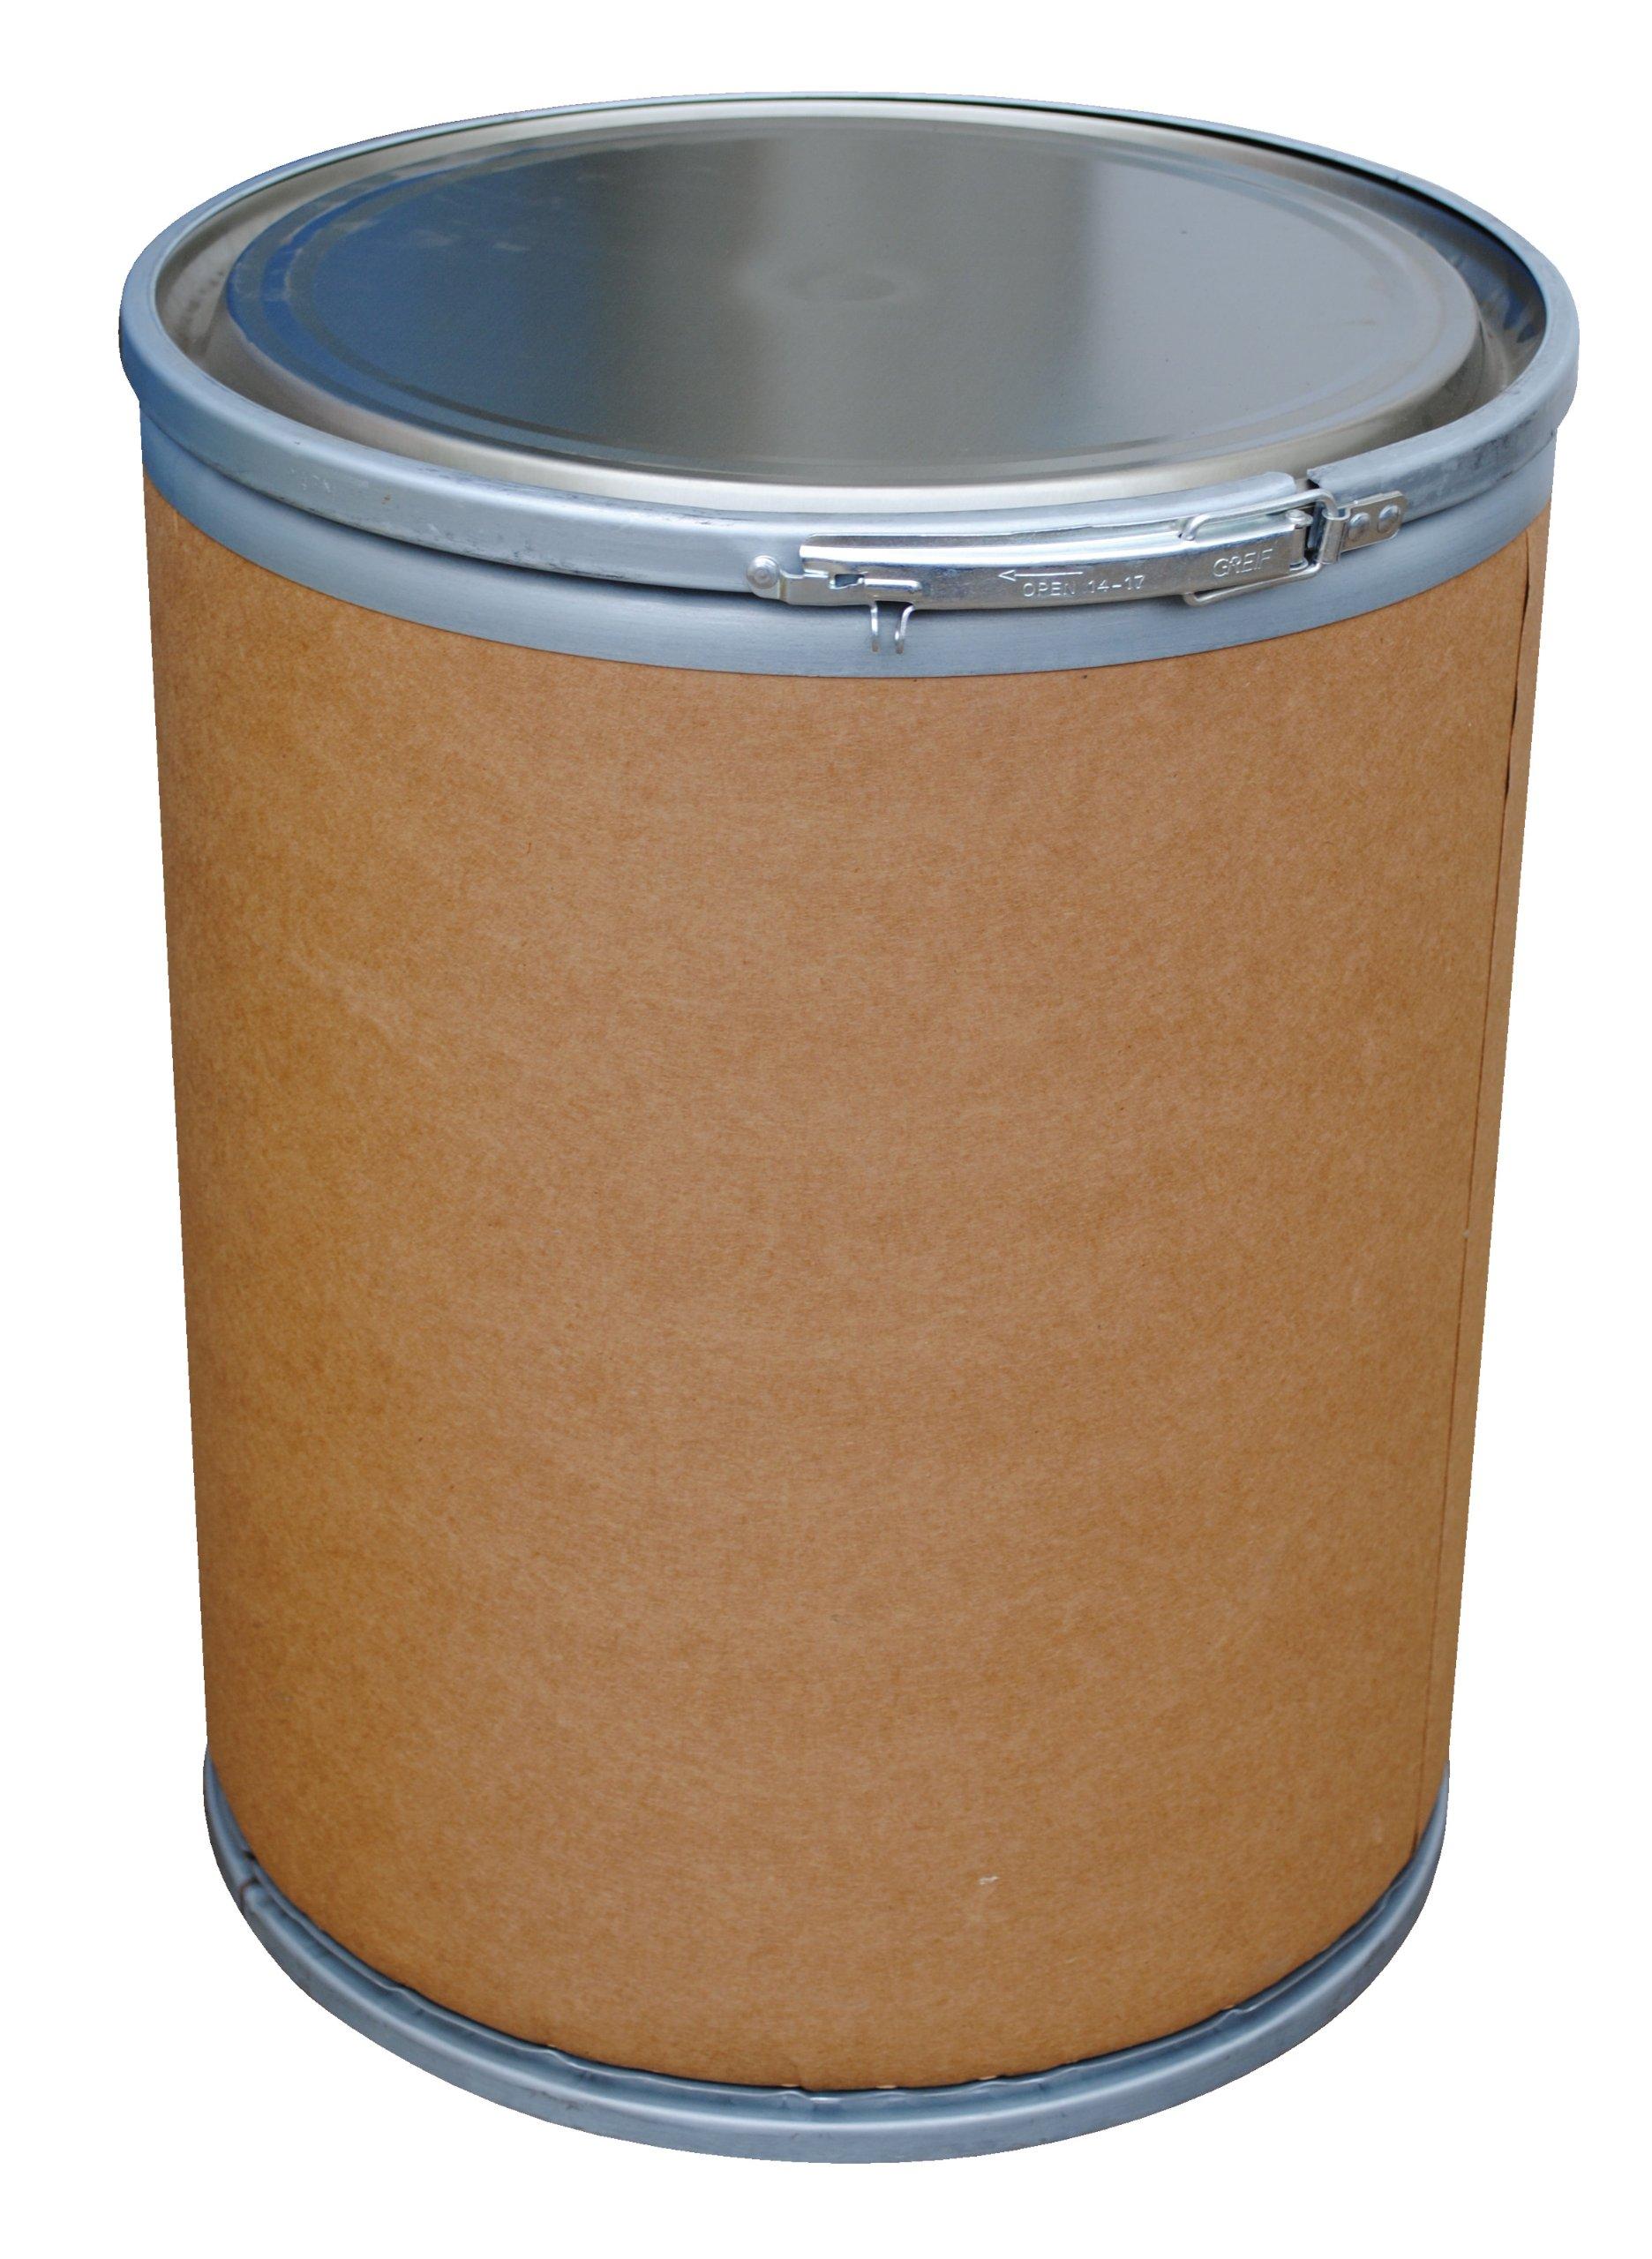 Vestil FD-15 Fiber Open Head Drum, 15 Gallon Capacity, 20'' Height x 15-3/4'' Diameter